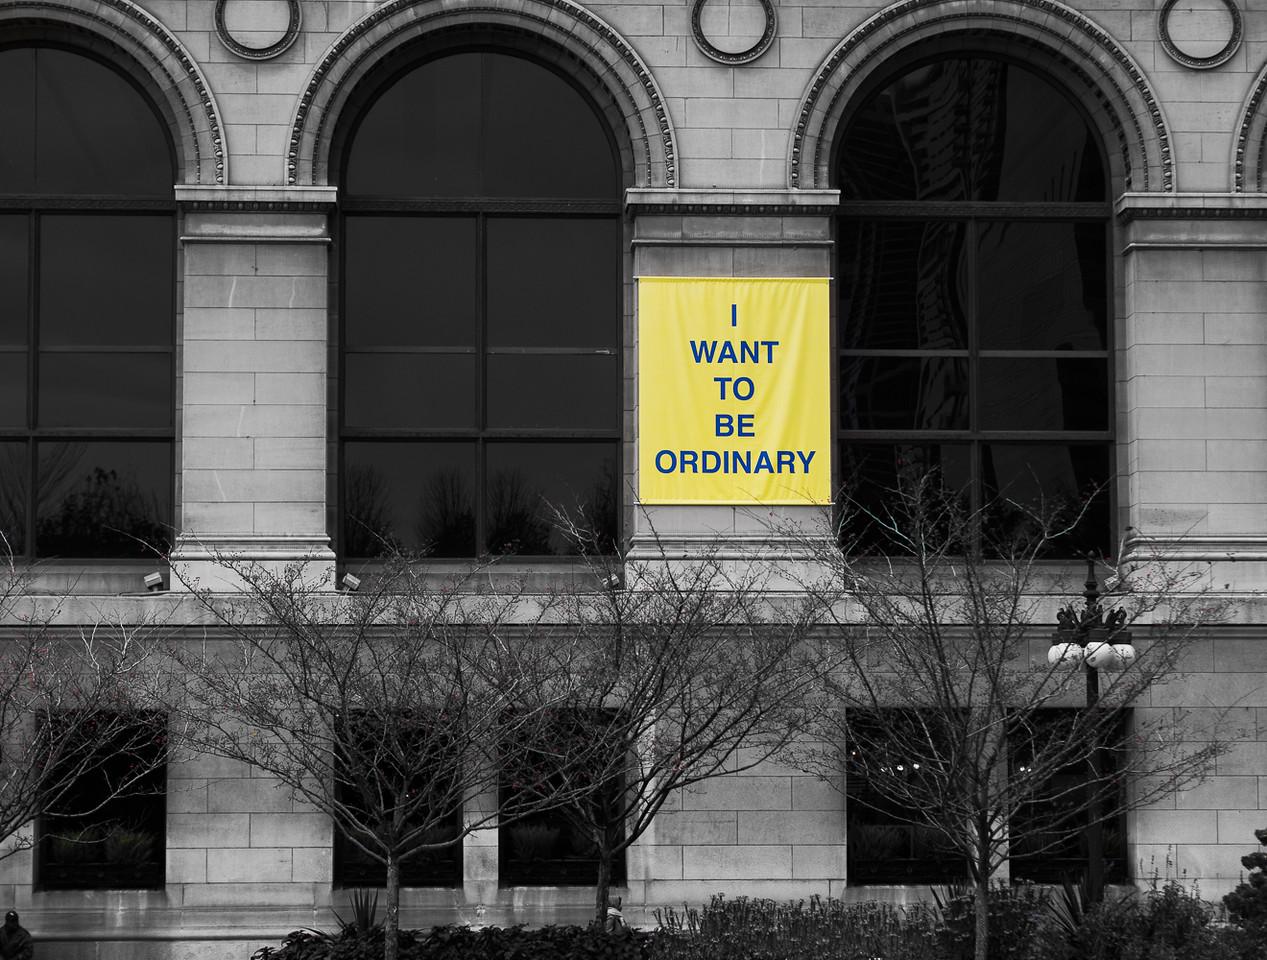 I Want To Be Ordinary